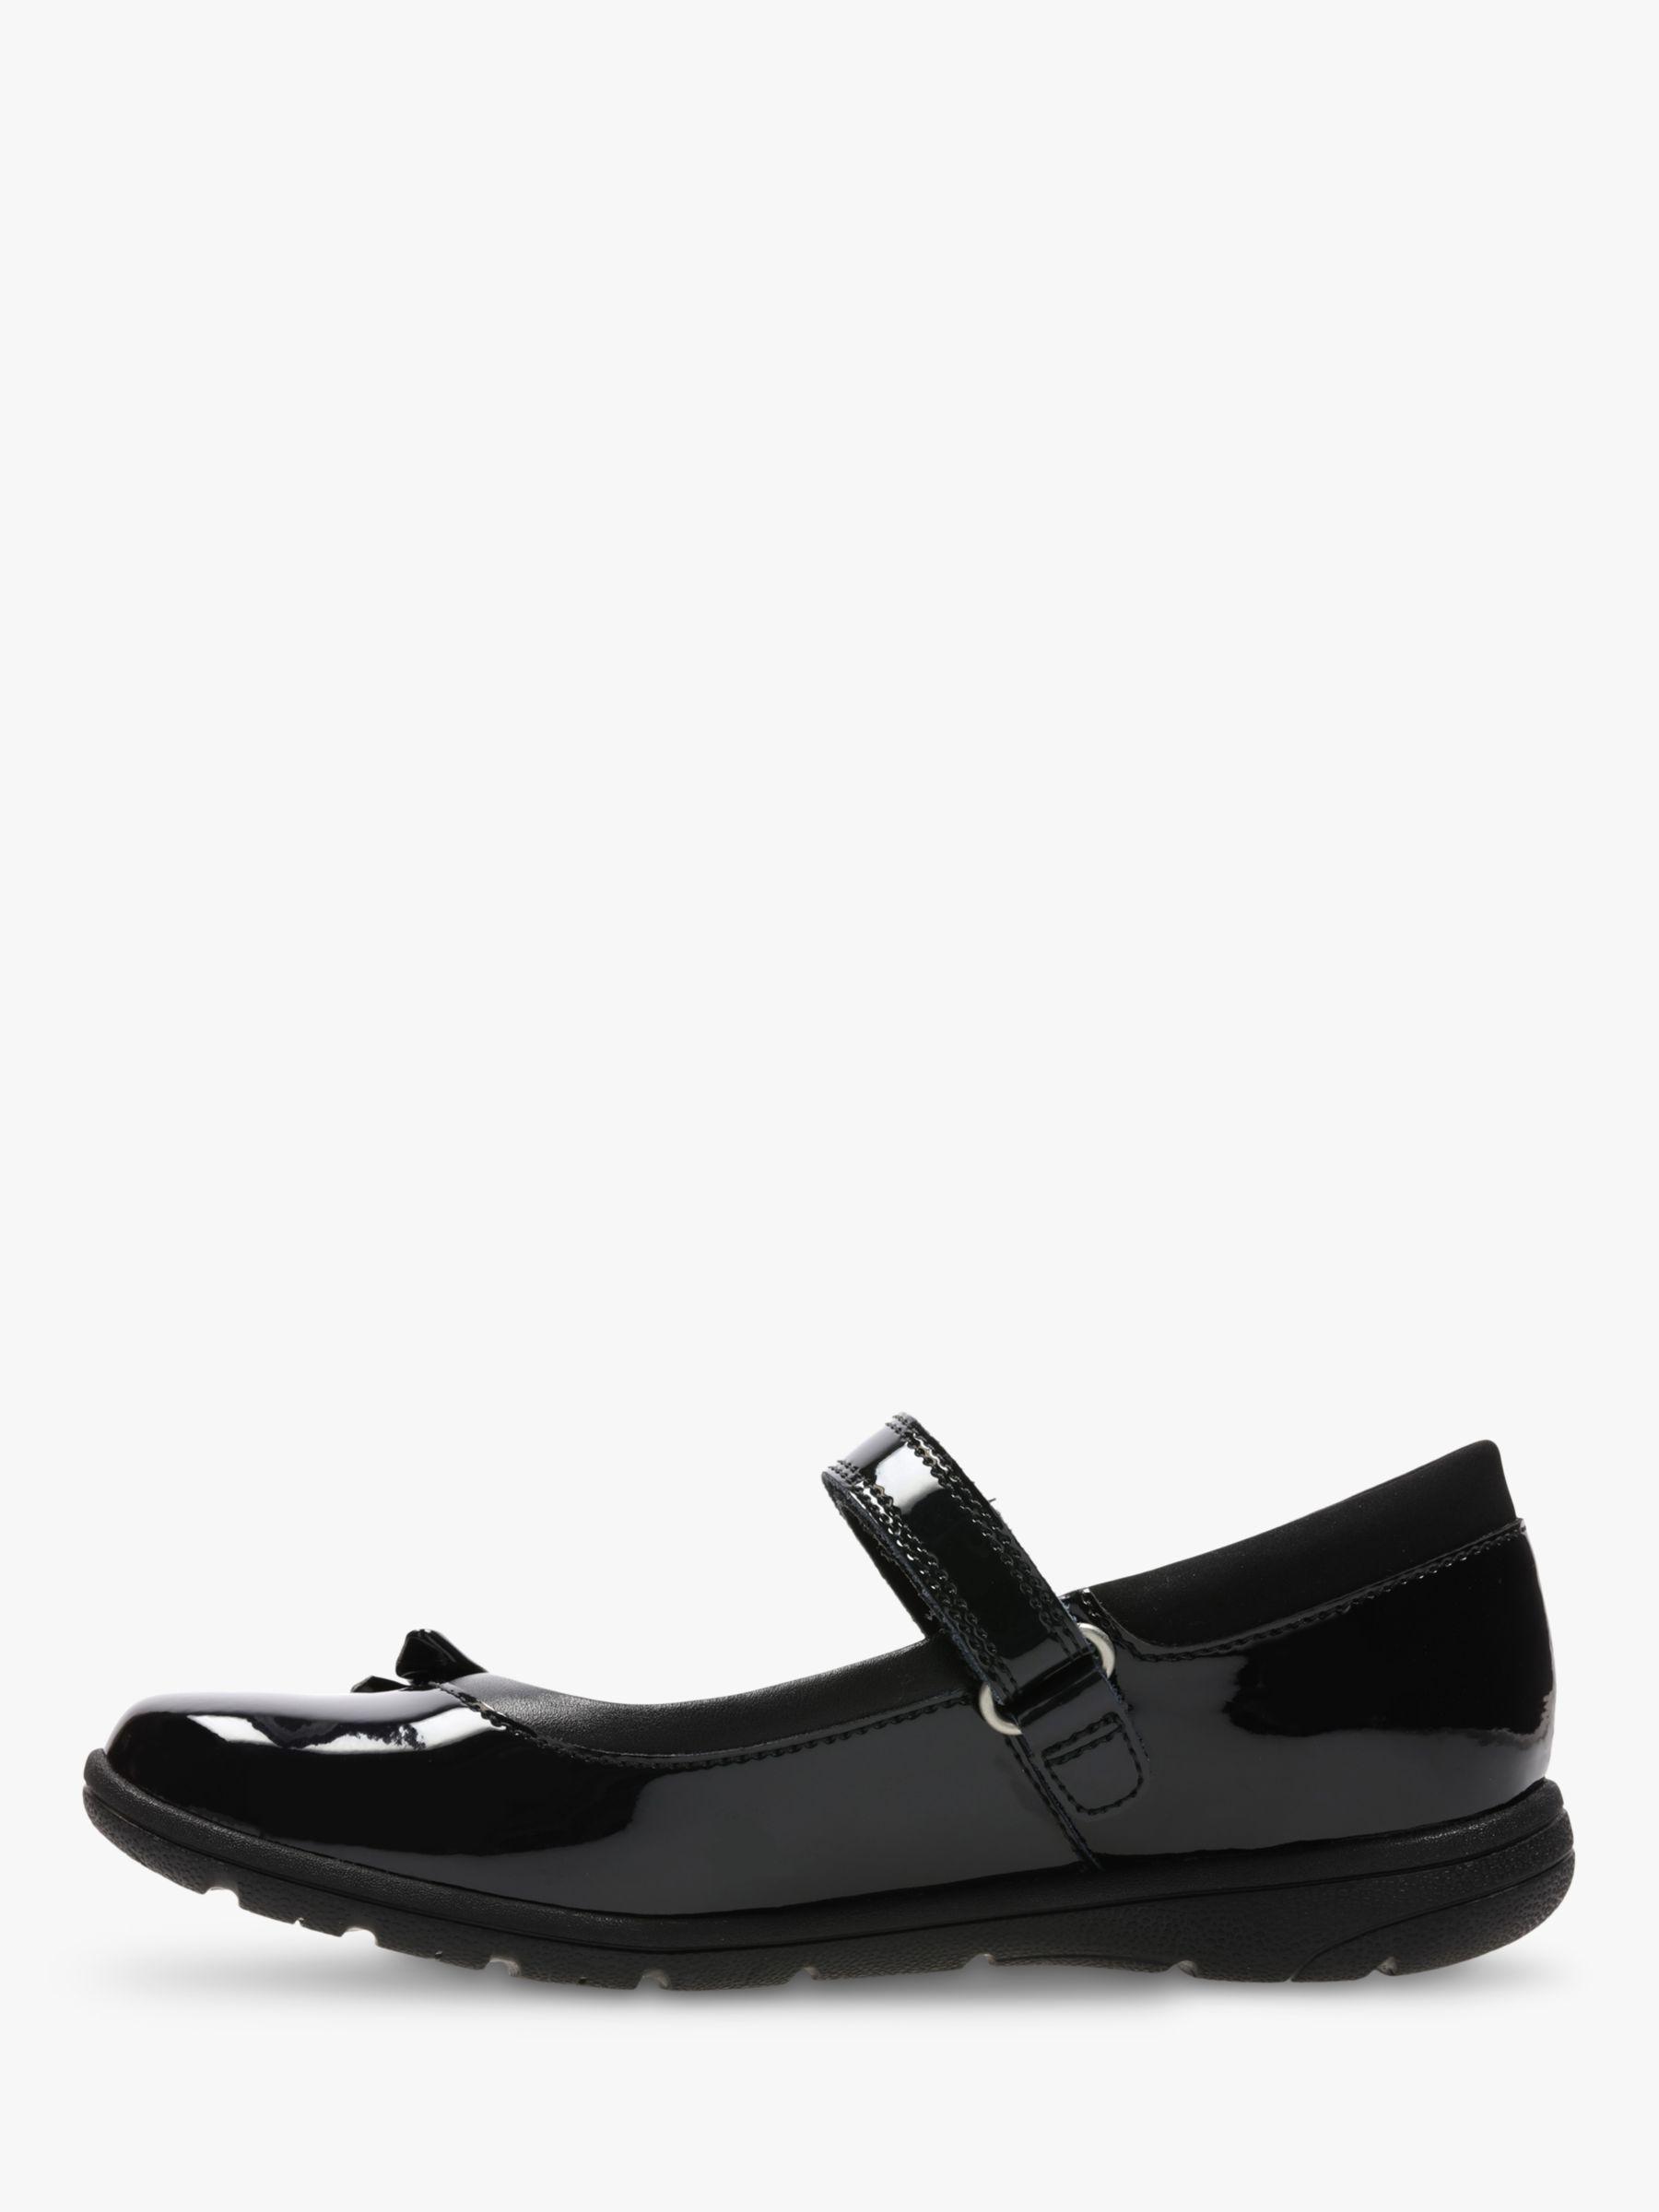 Clarks Children's Venture Star Shoes, Black Patent in 2019